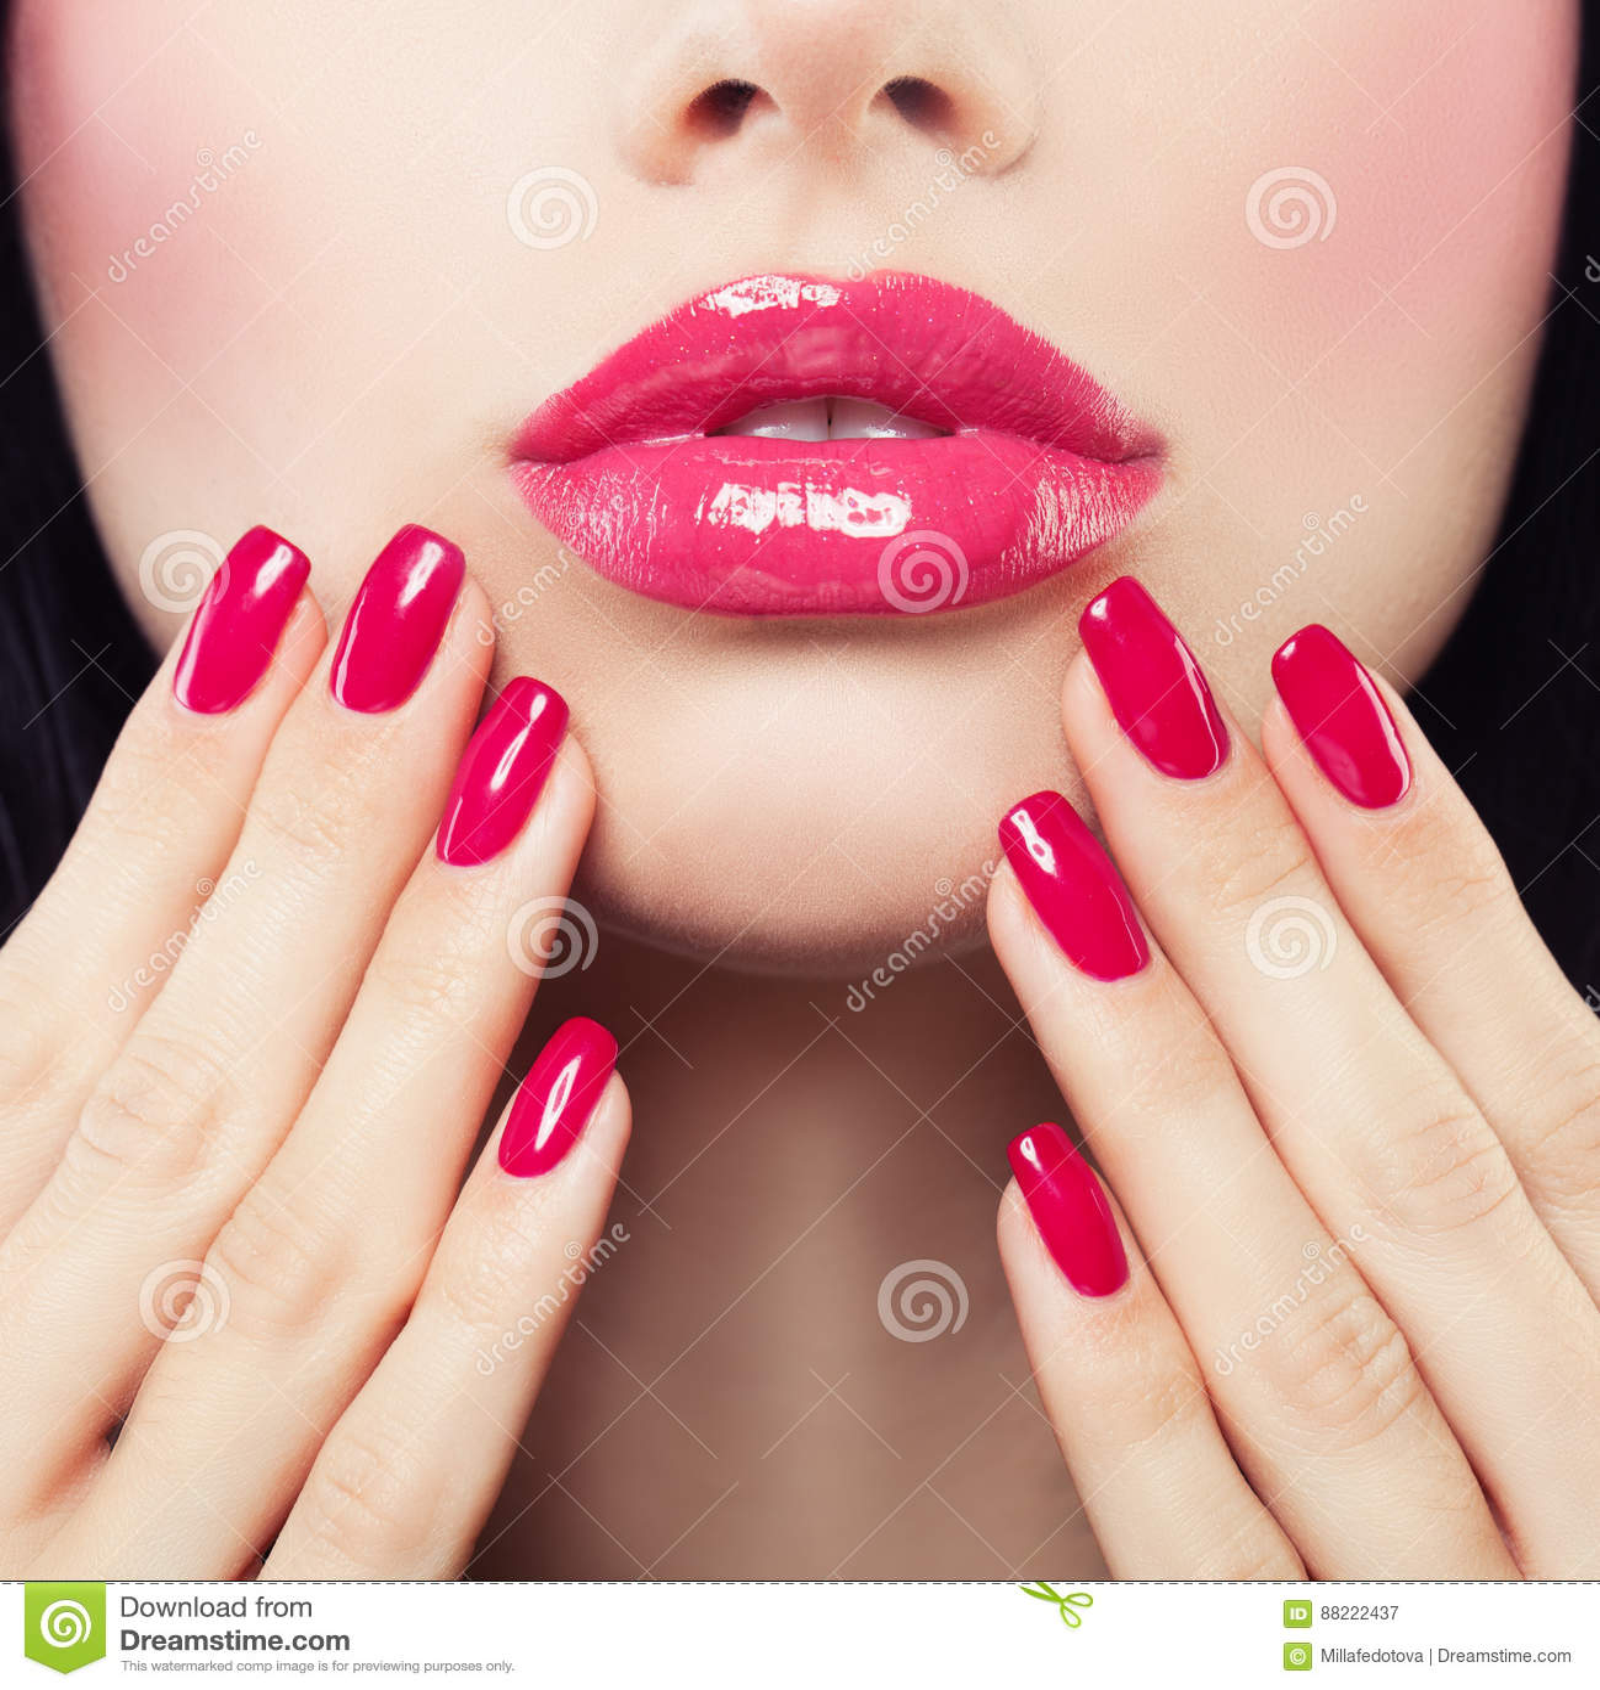 Make-uplippen Mit Rosa Glattem Lippenstift Und Rosa Nägeln Stockbild ...